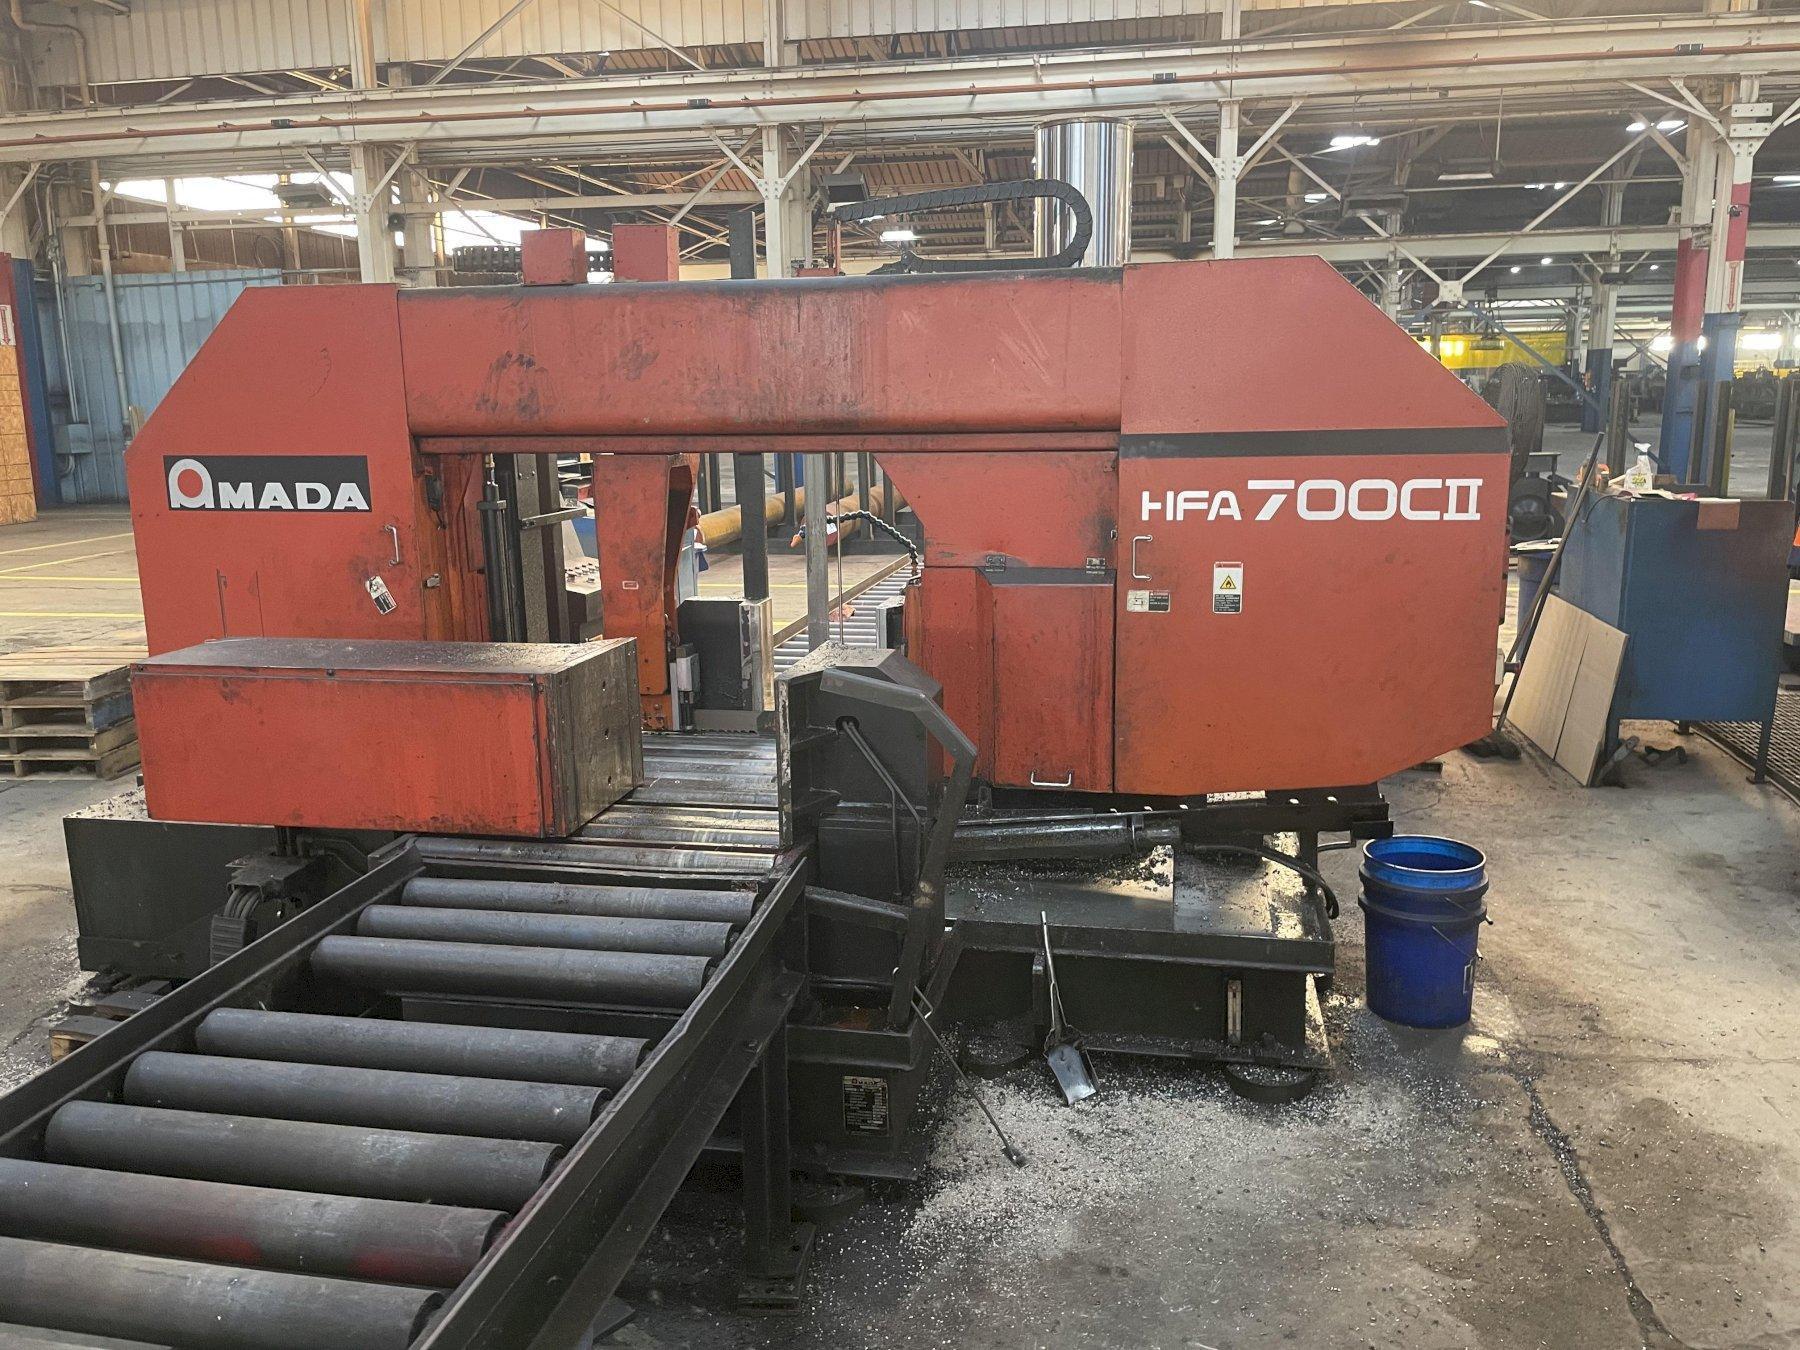 Amada HFA700CII Horizontal Fully Automatic Metal Cutting Band Saw